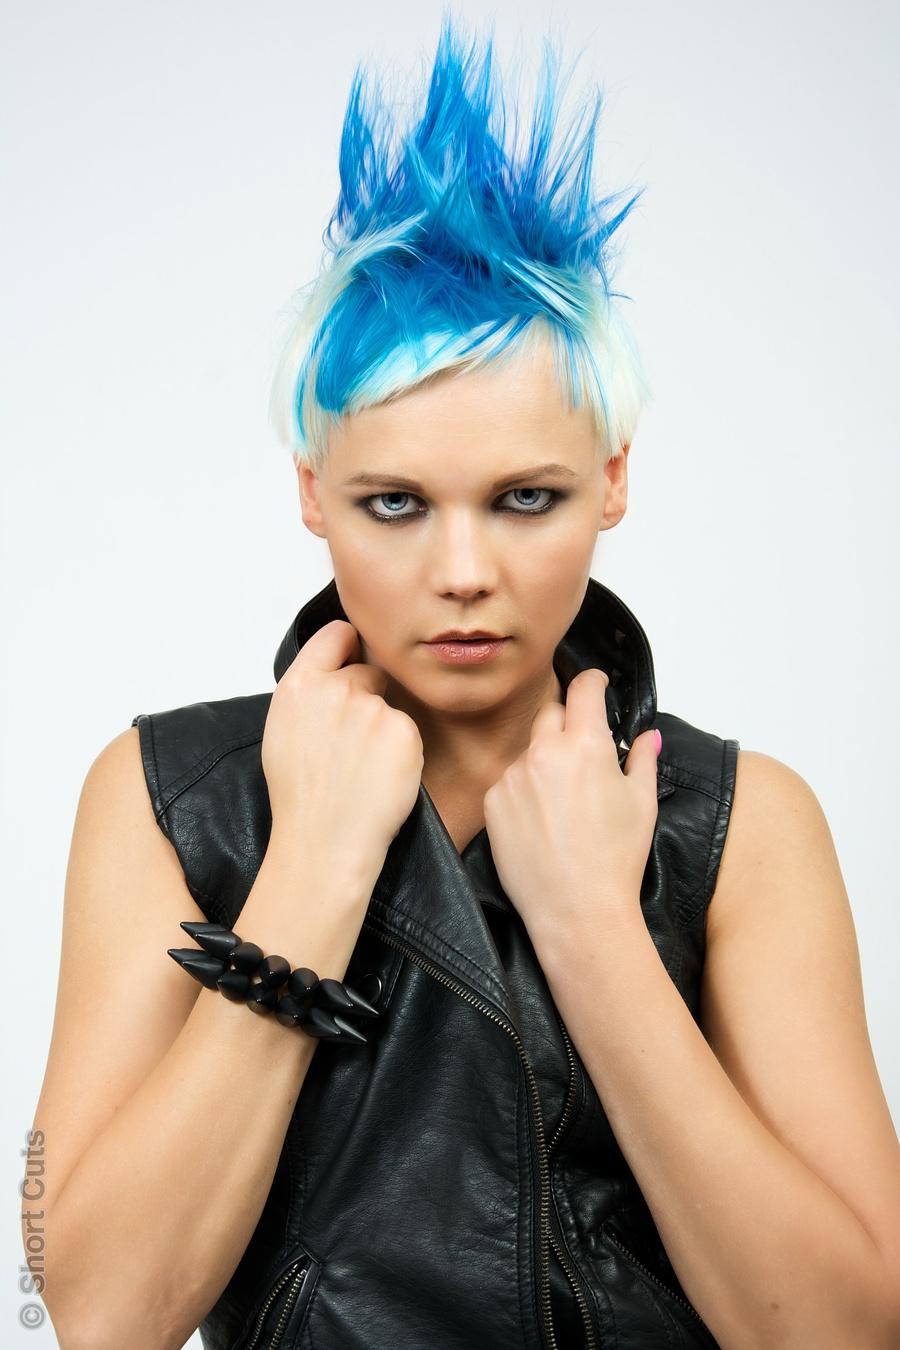 Kseniya / Photography by Stephen Norris, Model Kseniya, Hair styling by Chris Evans / Uploaded 23rd November 2014 @ 01:15 PM